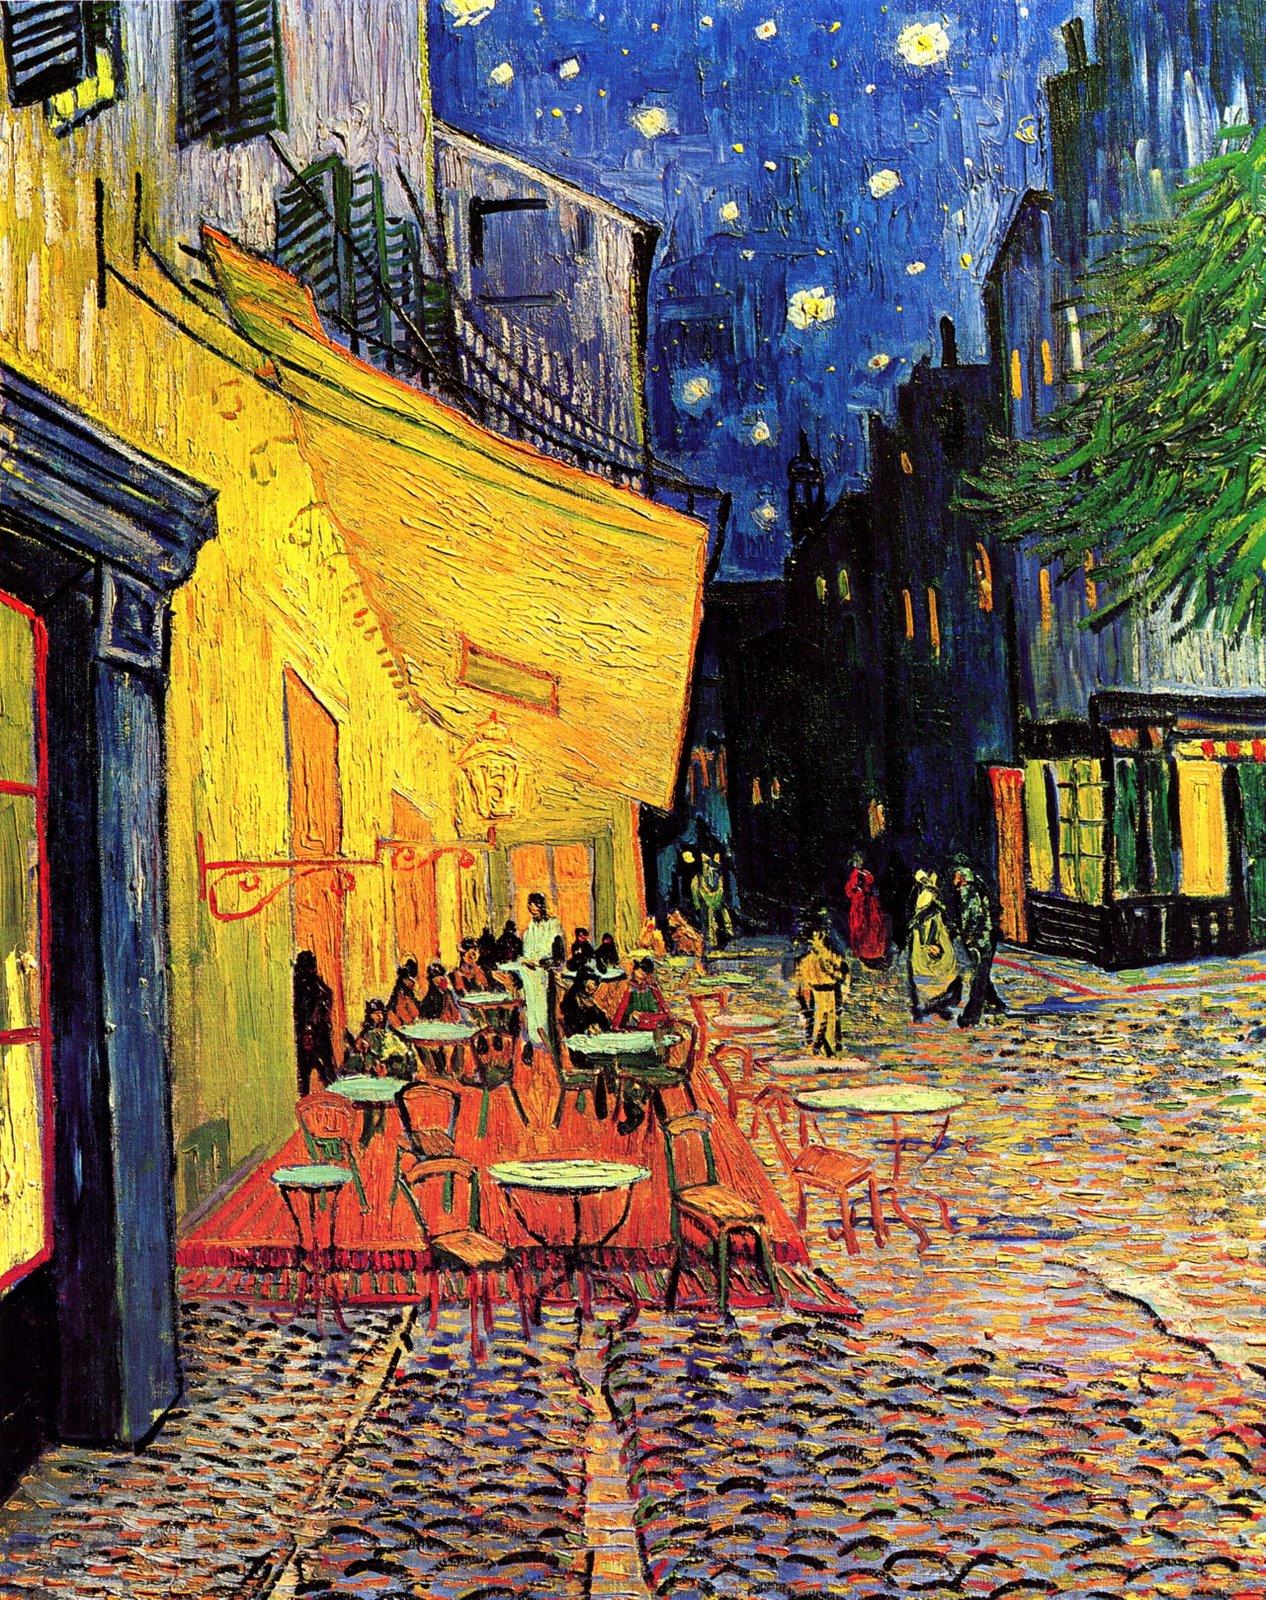 http://1.bp.blogspot.com/-OczB4O_5lHY/T3DTWvUYiRI/AAAAAAAAWSI/kfXutlysT8E/s1600/vicnet-van-gogh-cafe-terrace-at-night.jpg